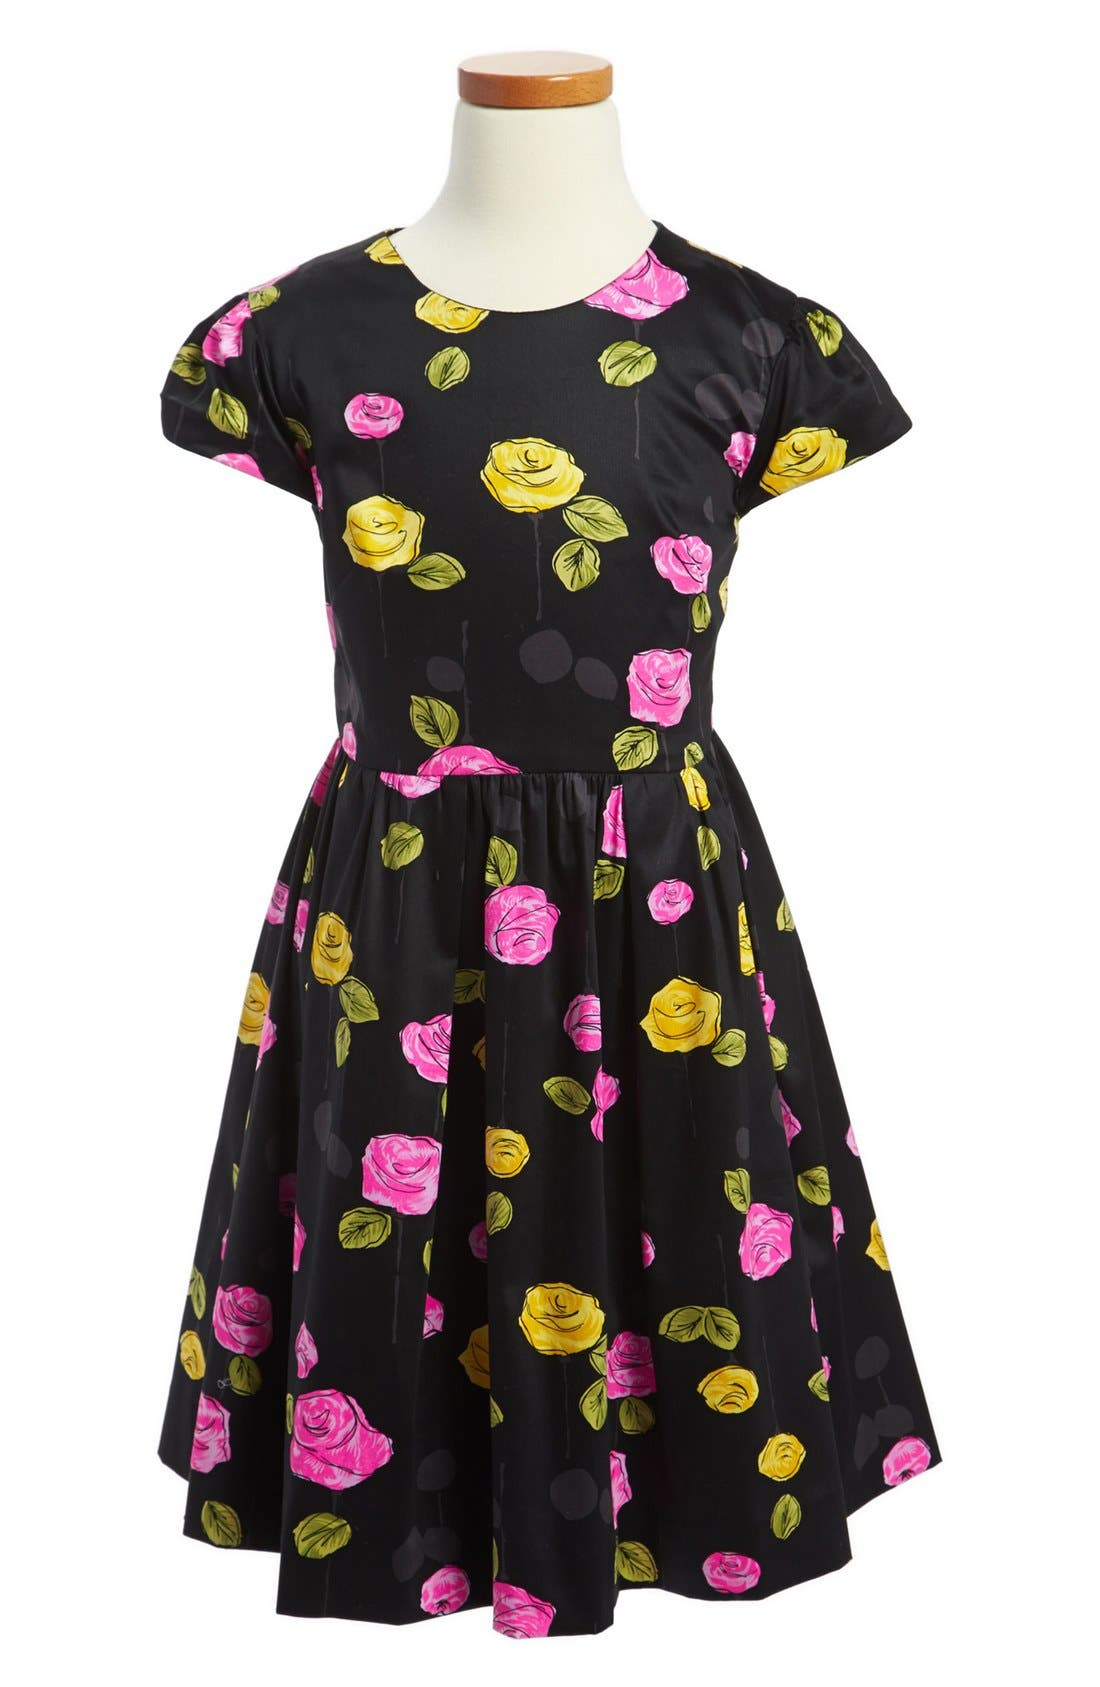 Alternate Image 1 Selected - Milly Minis 'Mischa' Dress (Toddler Girls, Little Girls & Big Girls)